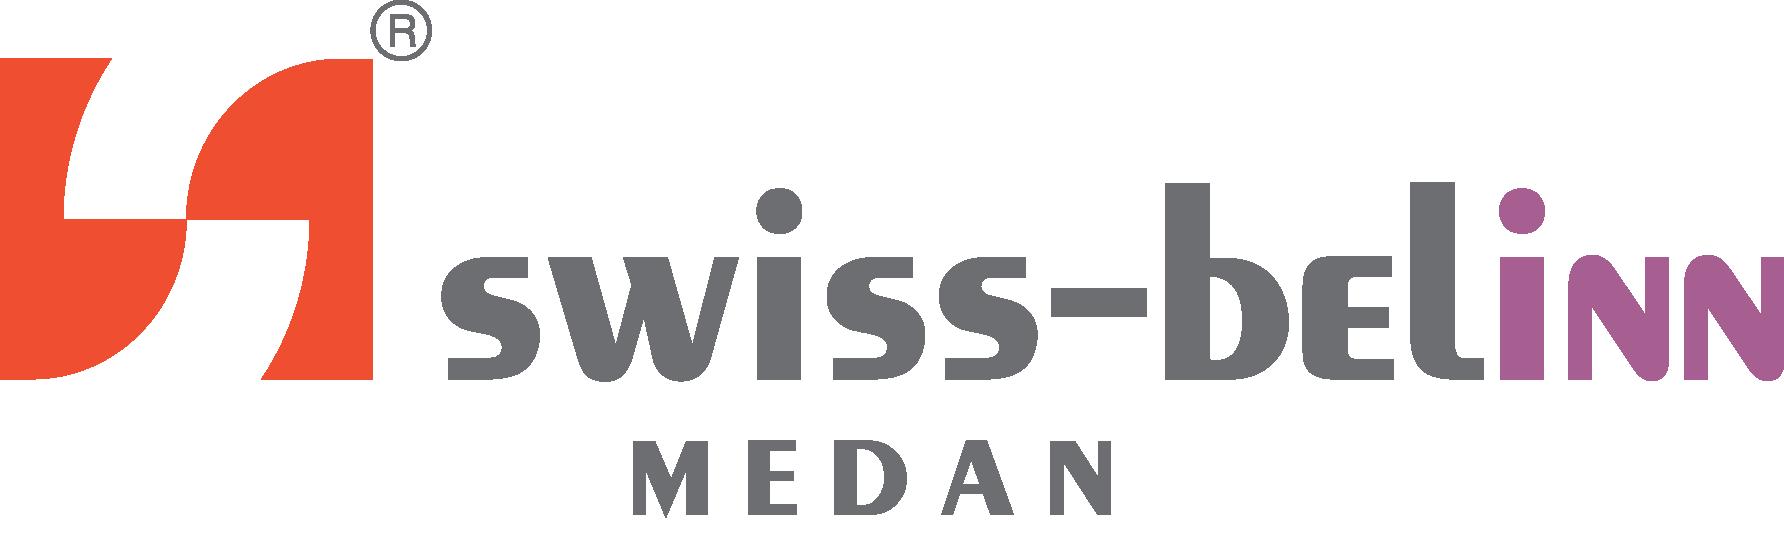 Swiss-Belinn Medan